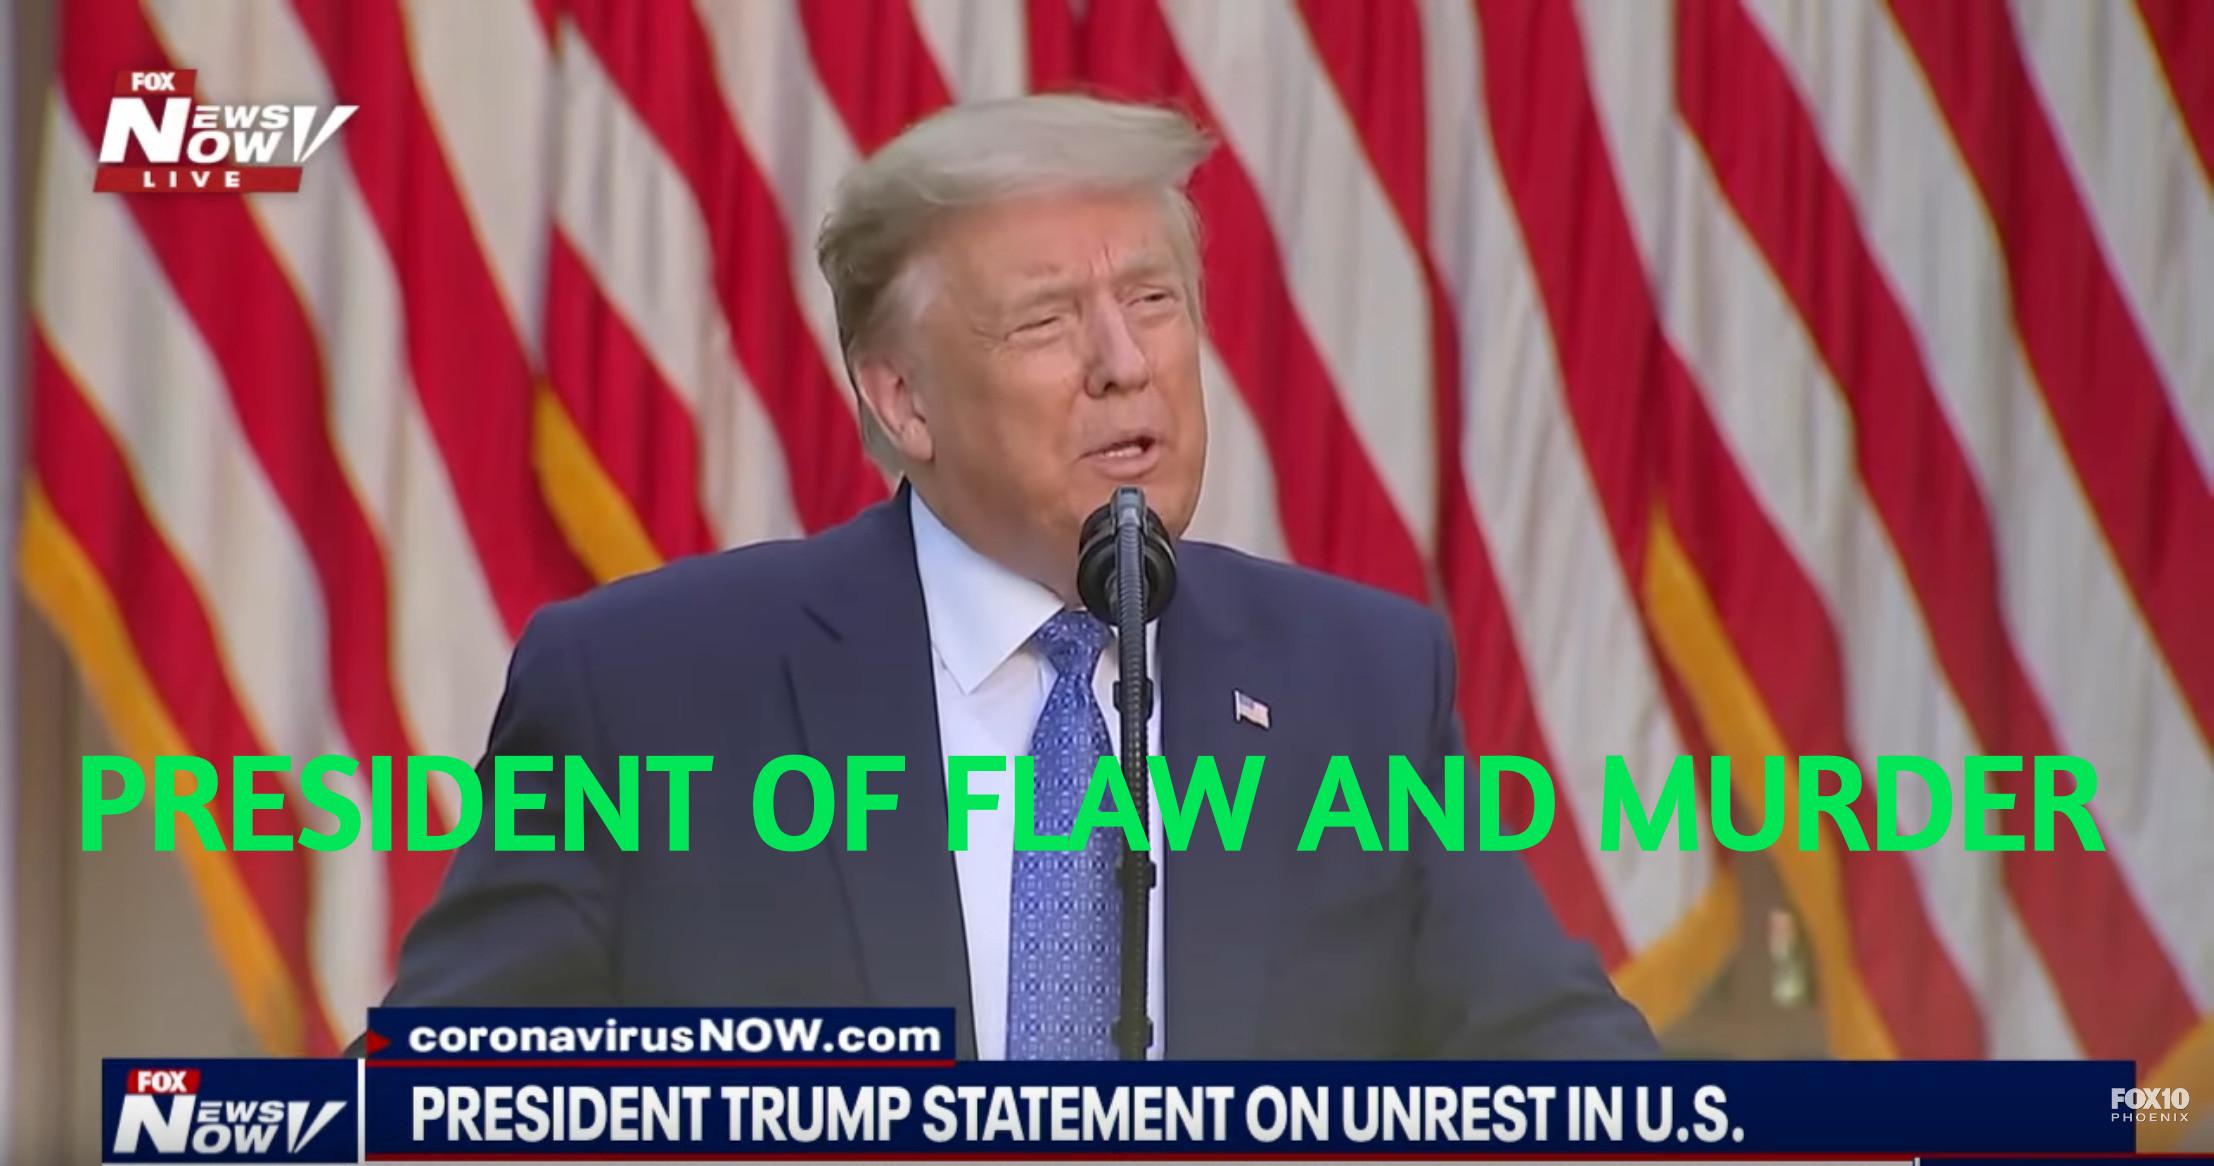 Screenshot-2020-06-02-PRESIDENT-OF-LAW-A